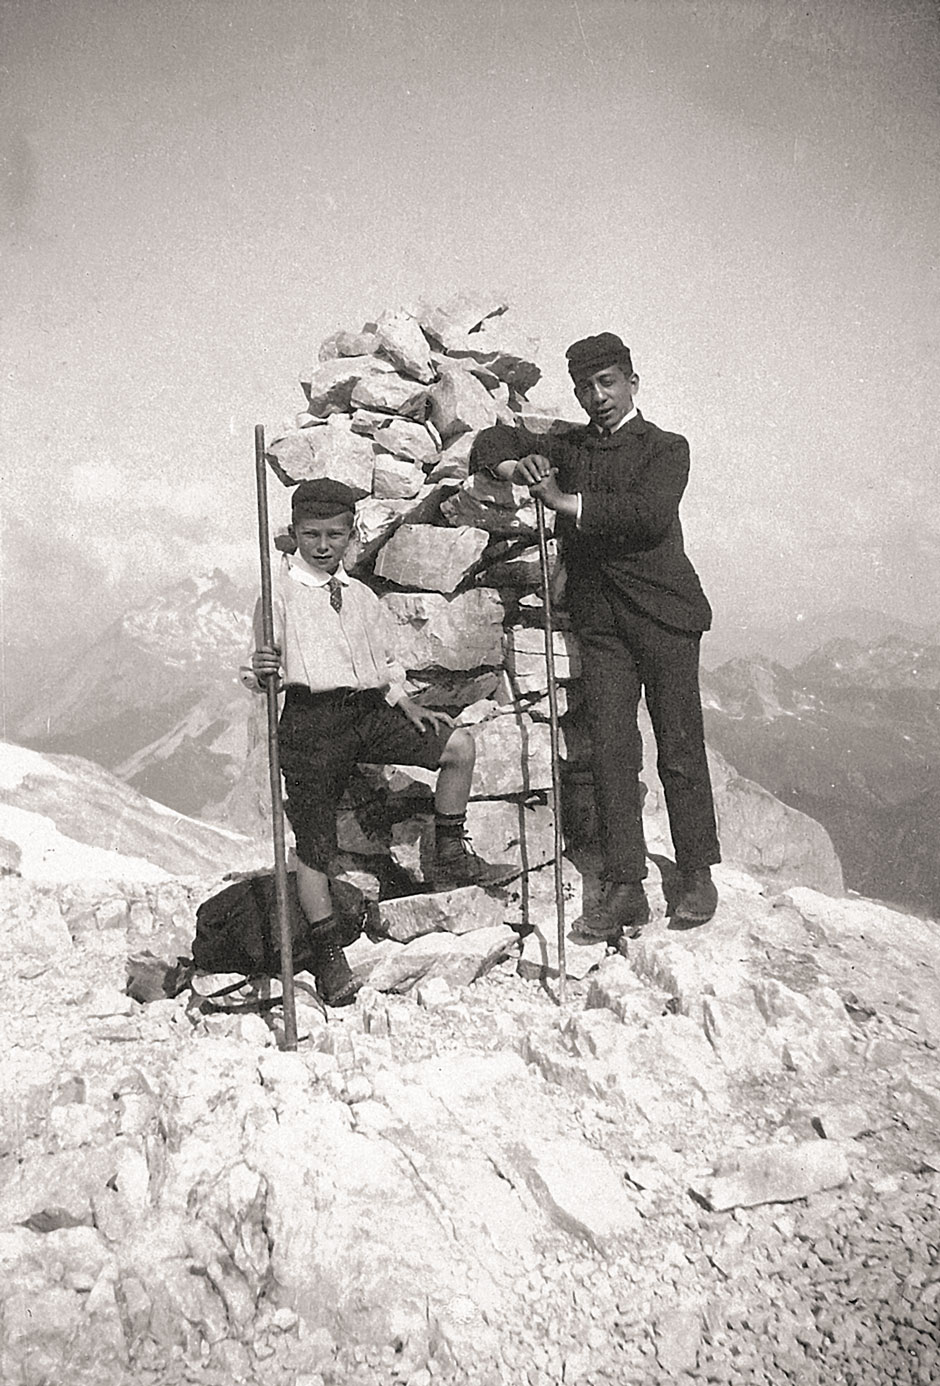 Kracauer alps.jpg